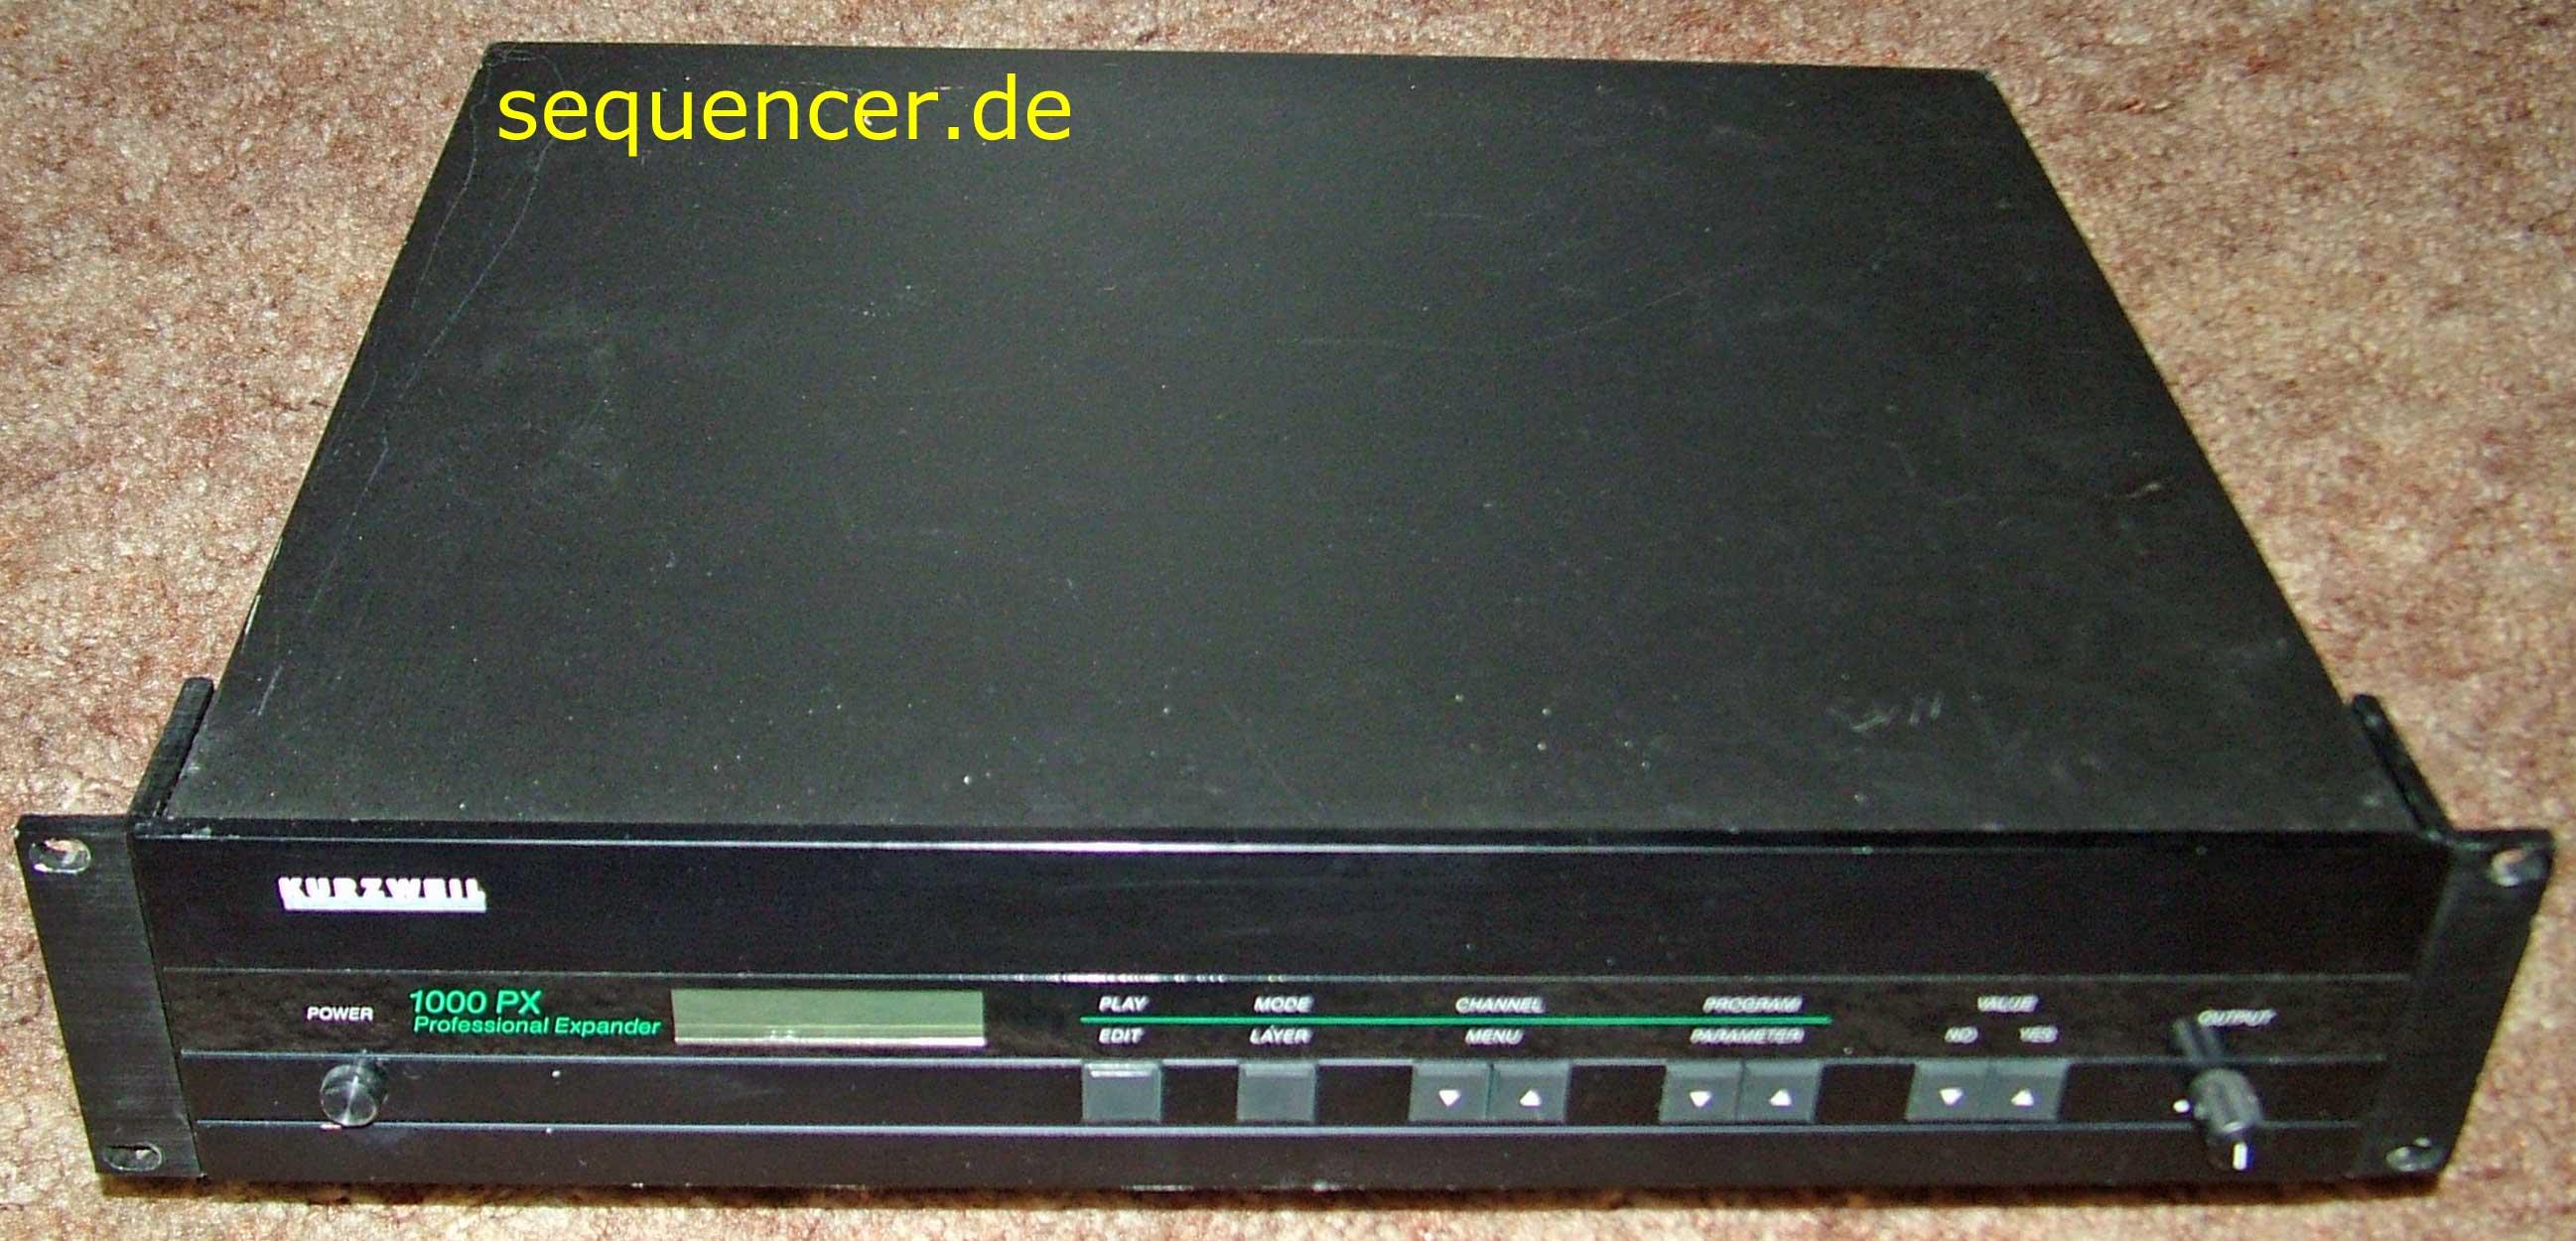 Kurzweil K1000SXA/K1000HXA/K1000PXA/K1000PXB